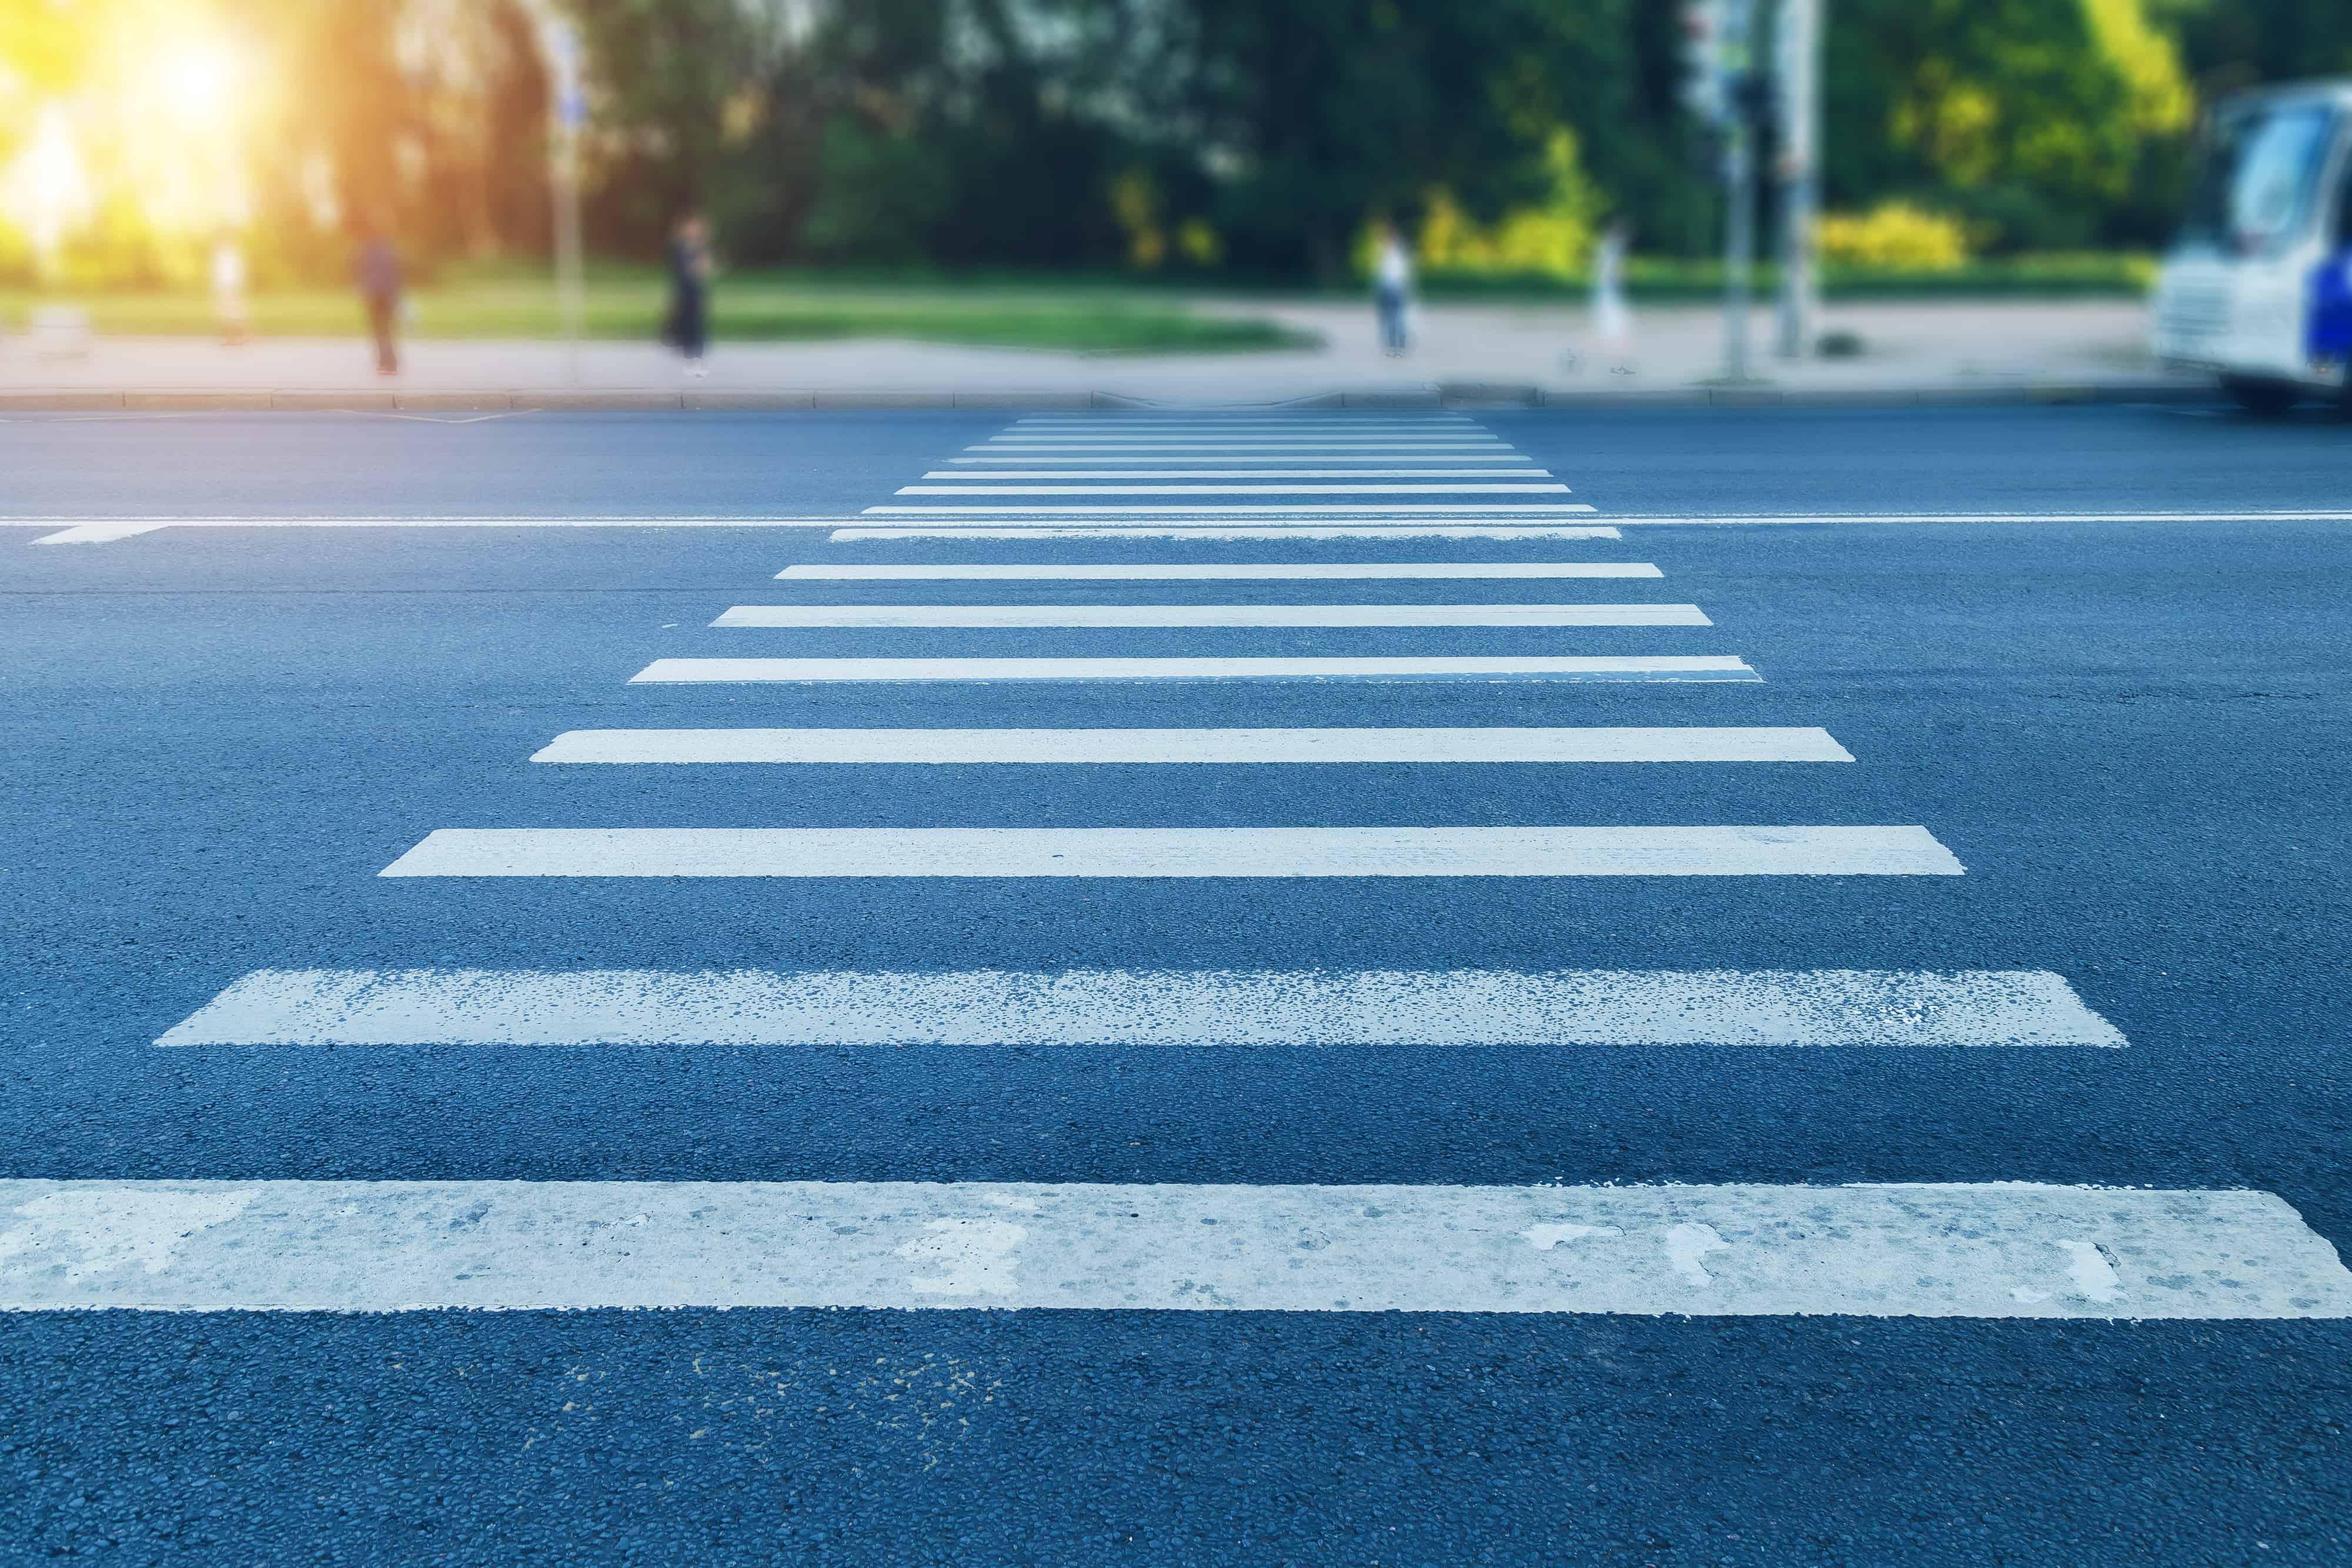 6-Year-Old Boy Dies in Parking Lot Crash on 12952 Lampson Avenue [Garden Grove, CA]